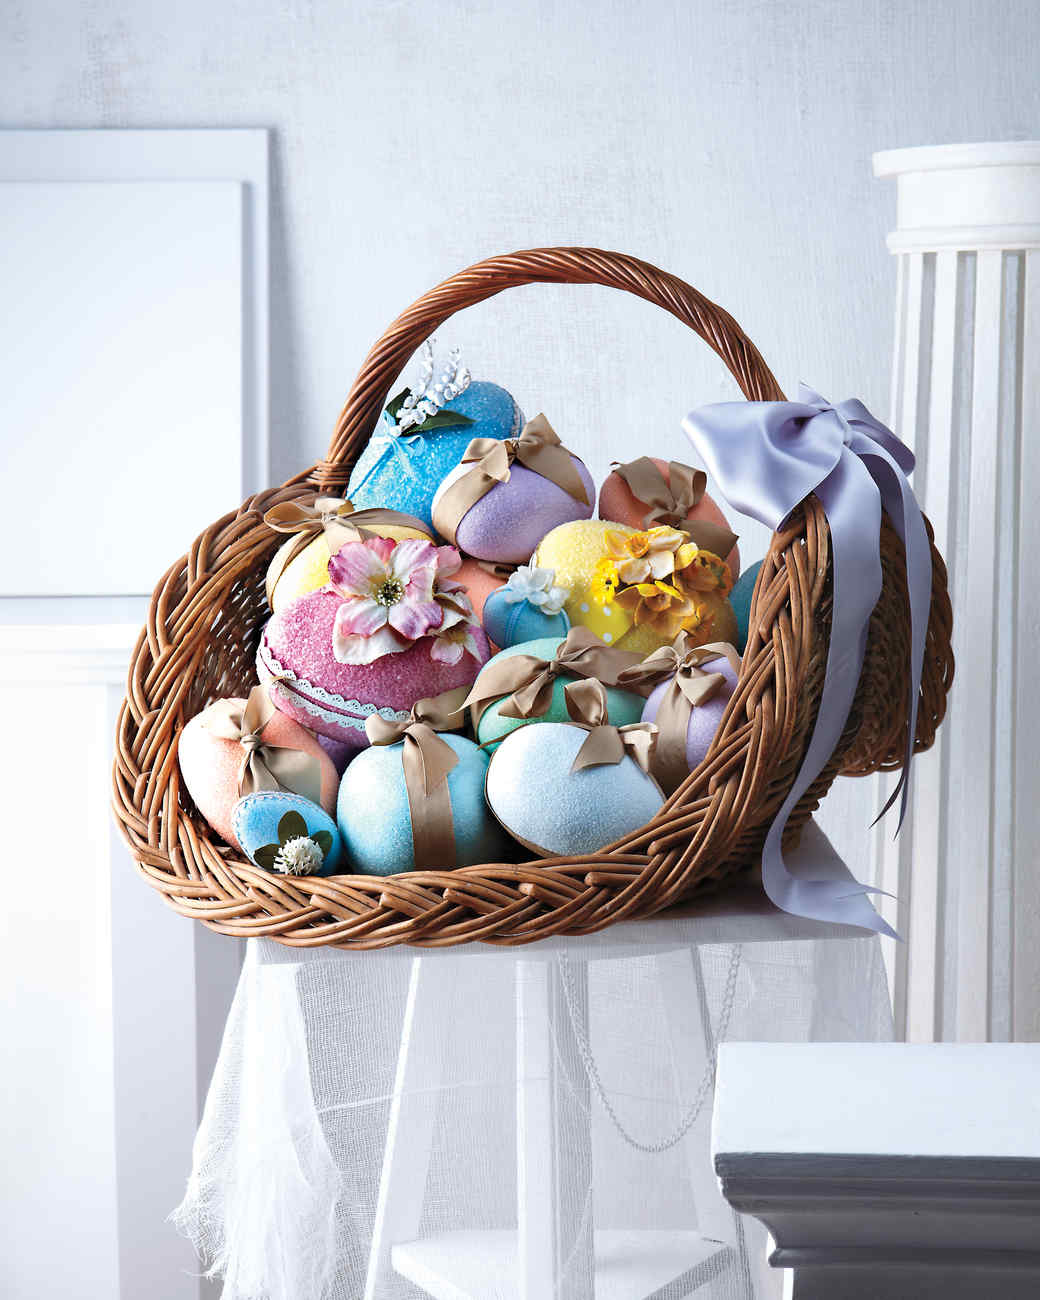 easter-basket-large-eggs-042-mld109766.jpg